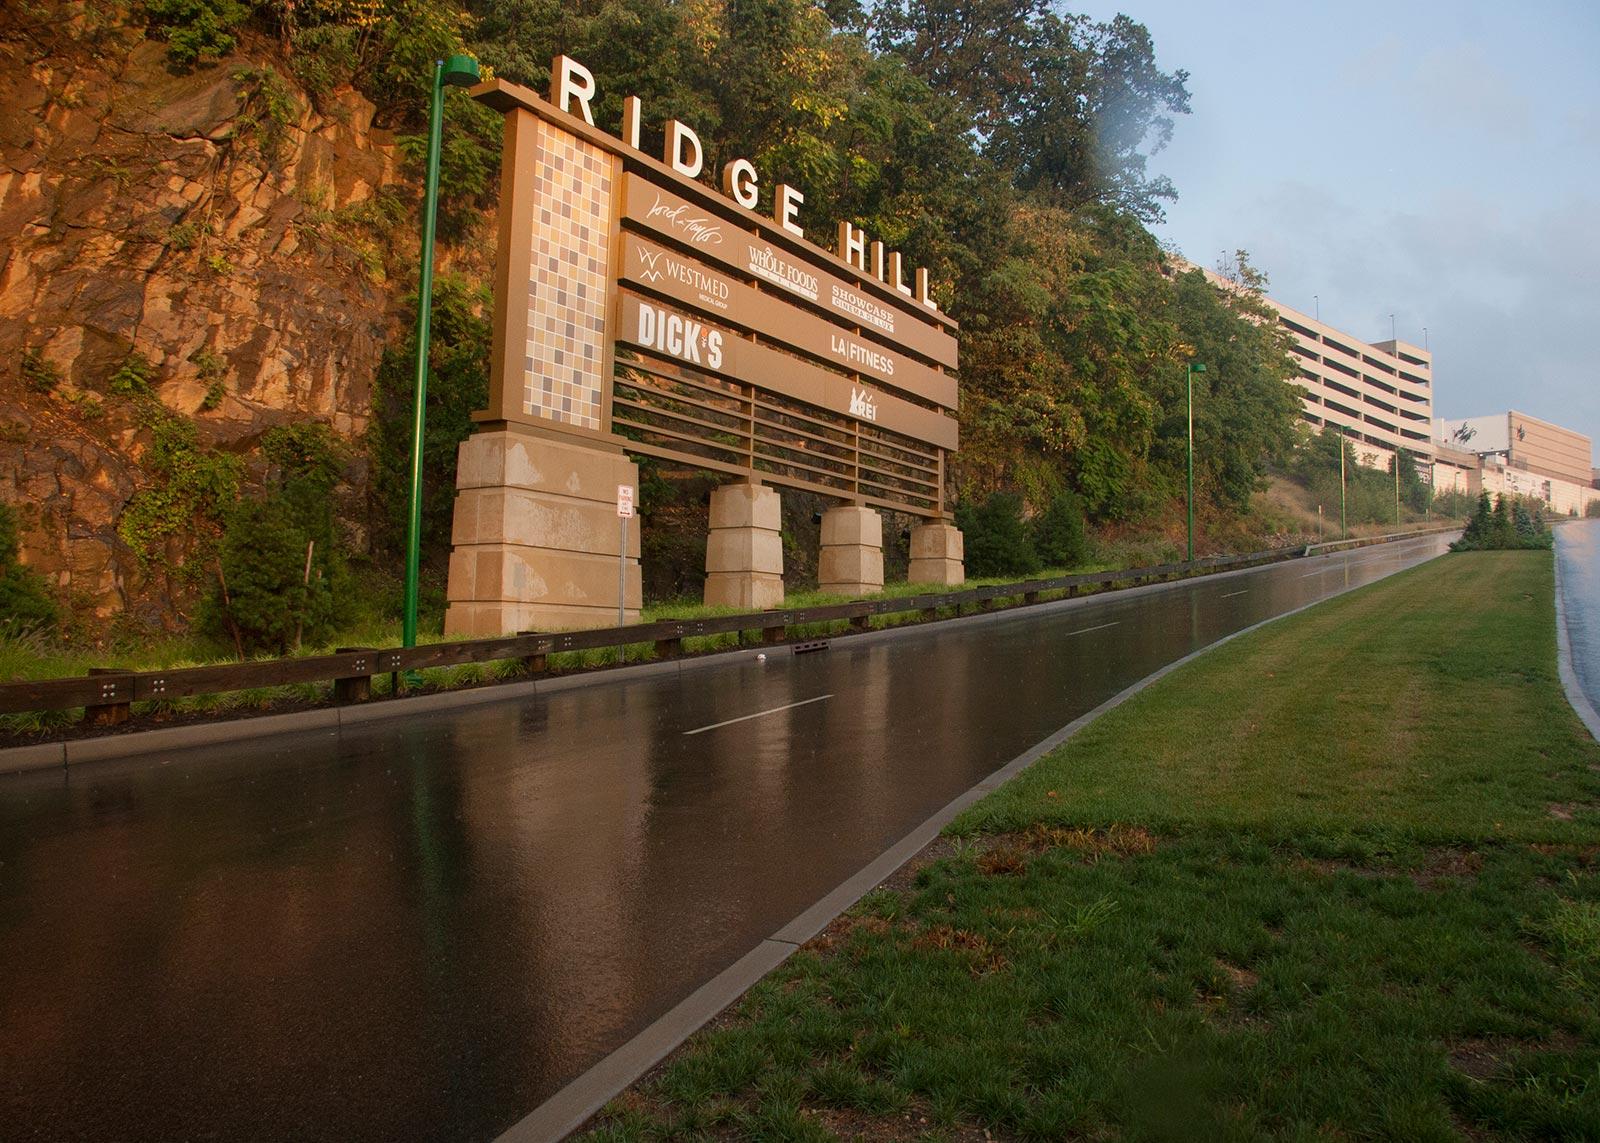 Ridge-Hill-Gallery-7